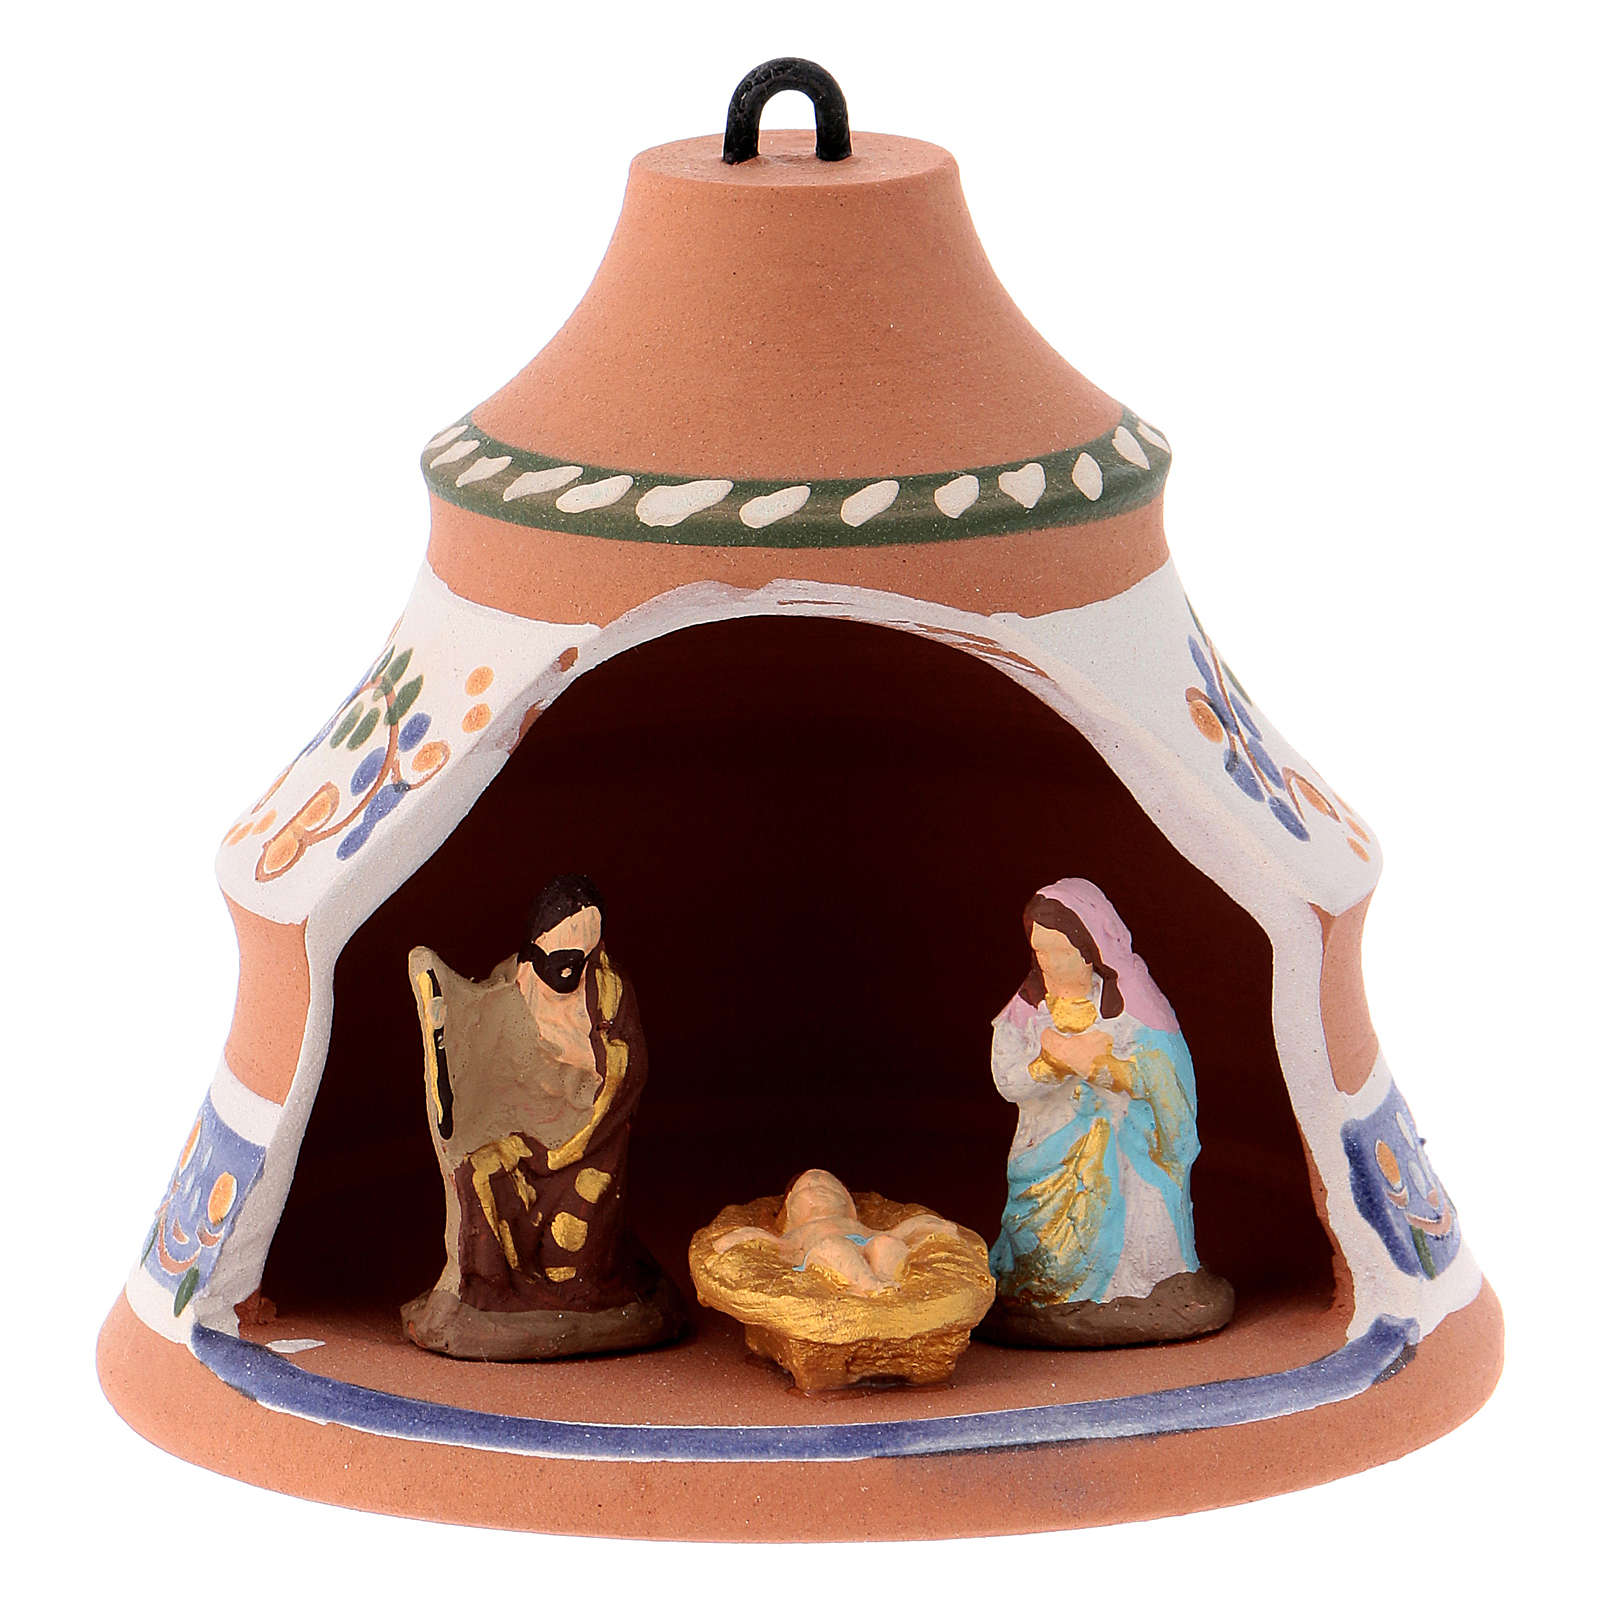 Bola forma de pino de cerámica pintada Deruta natividad 10x10x10 cm 4